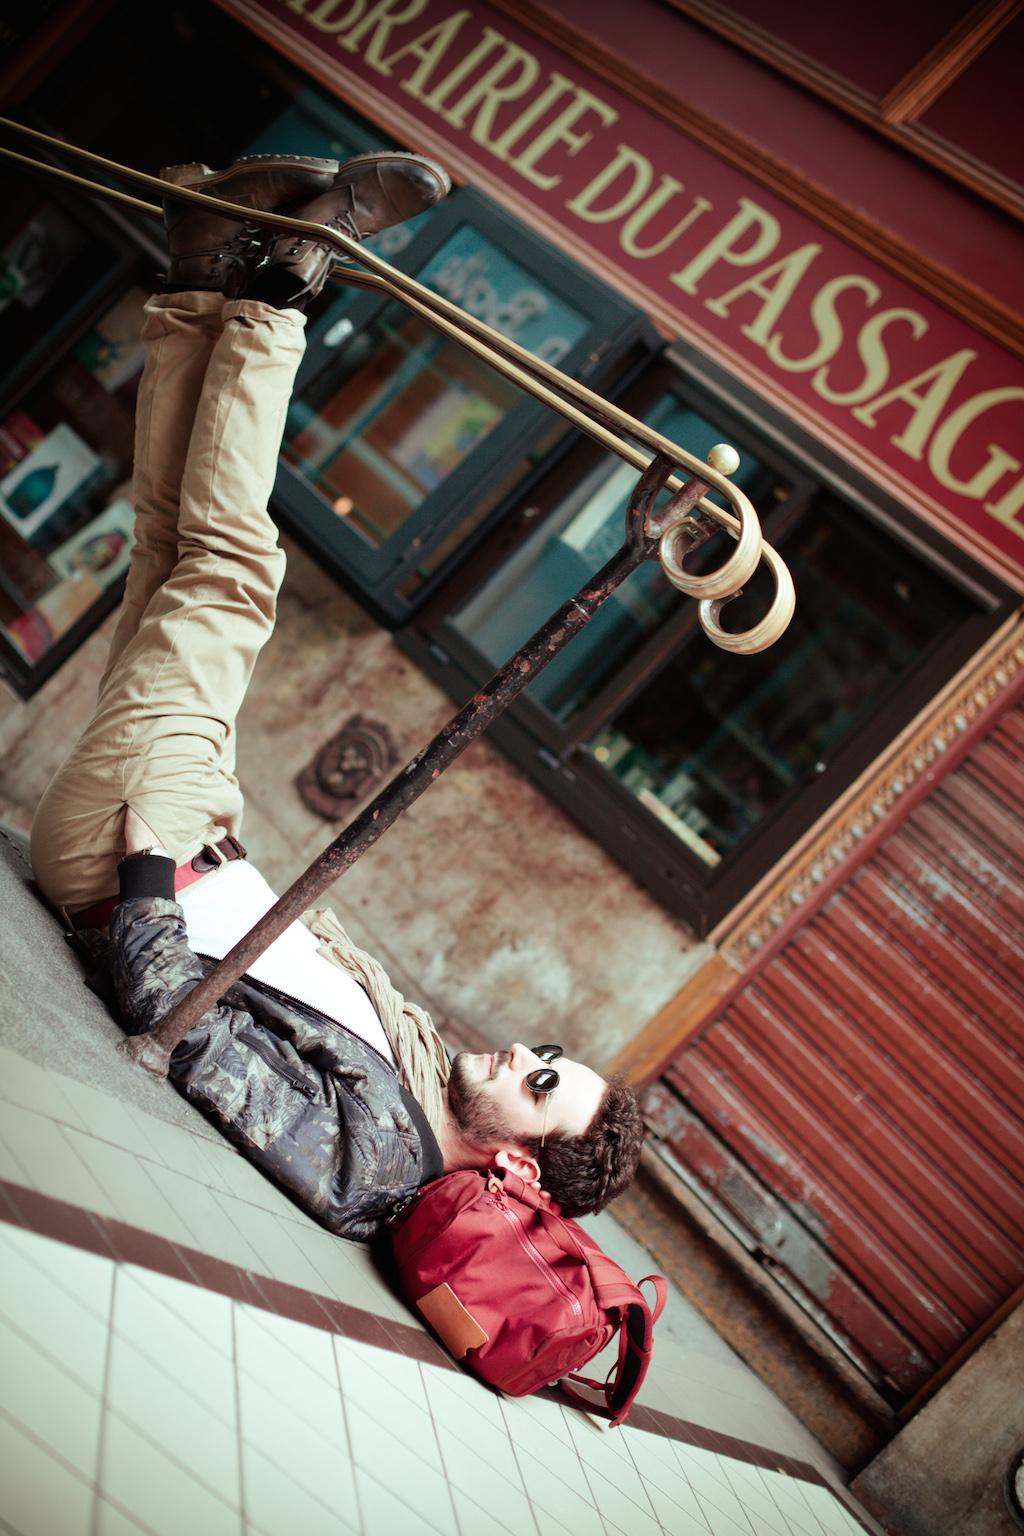 blog-mode-homme-izac-eastpak-ursul-oxygen-faguo-bunker-9